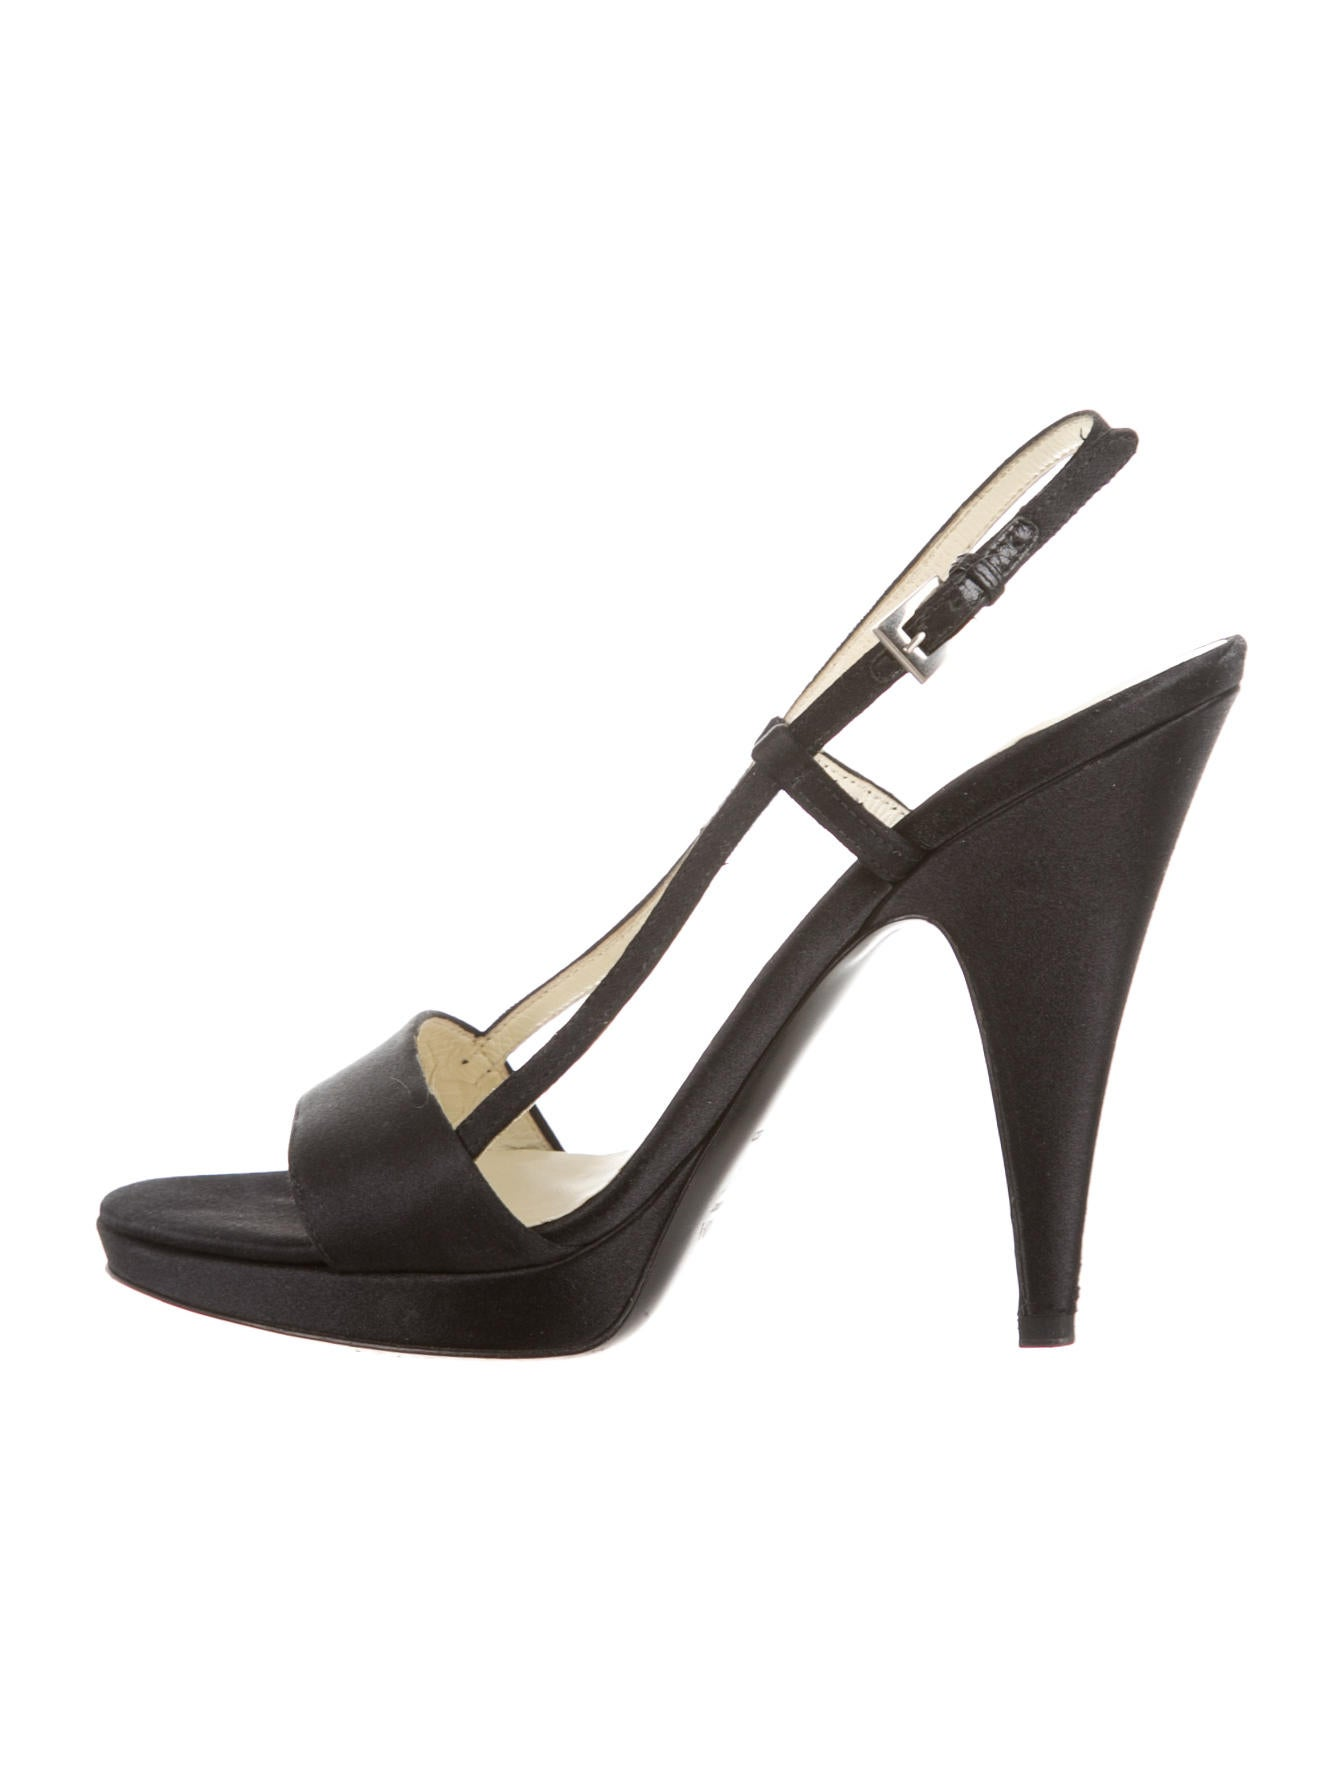 New Prada Sandals  Shoes  PRA65961  The RealReal